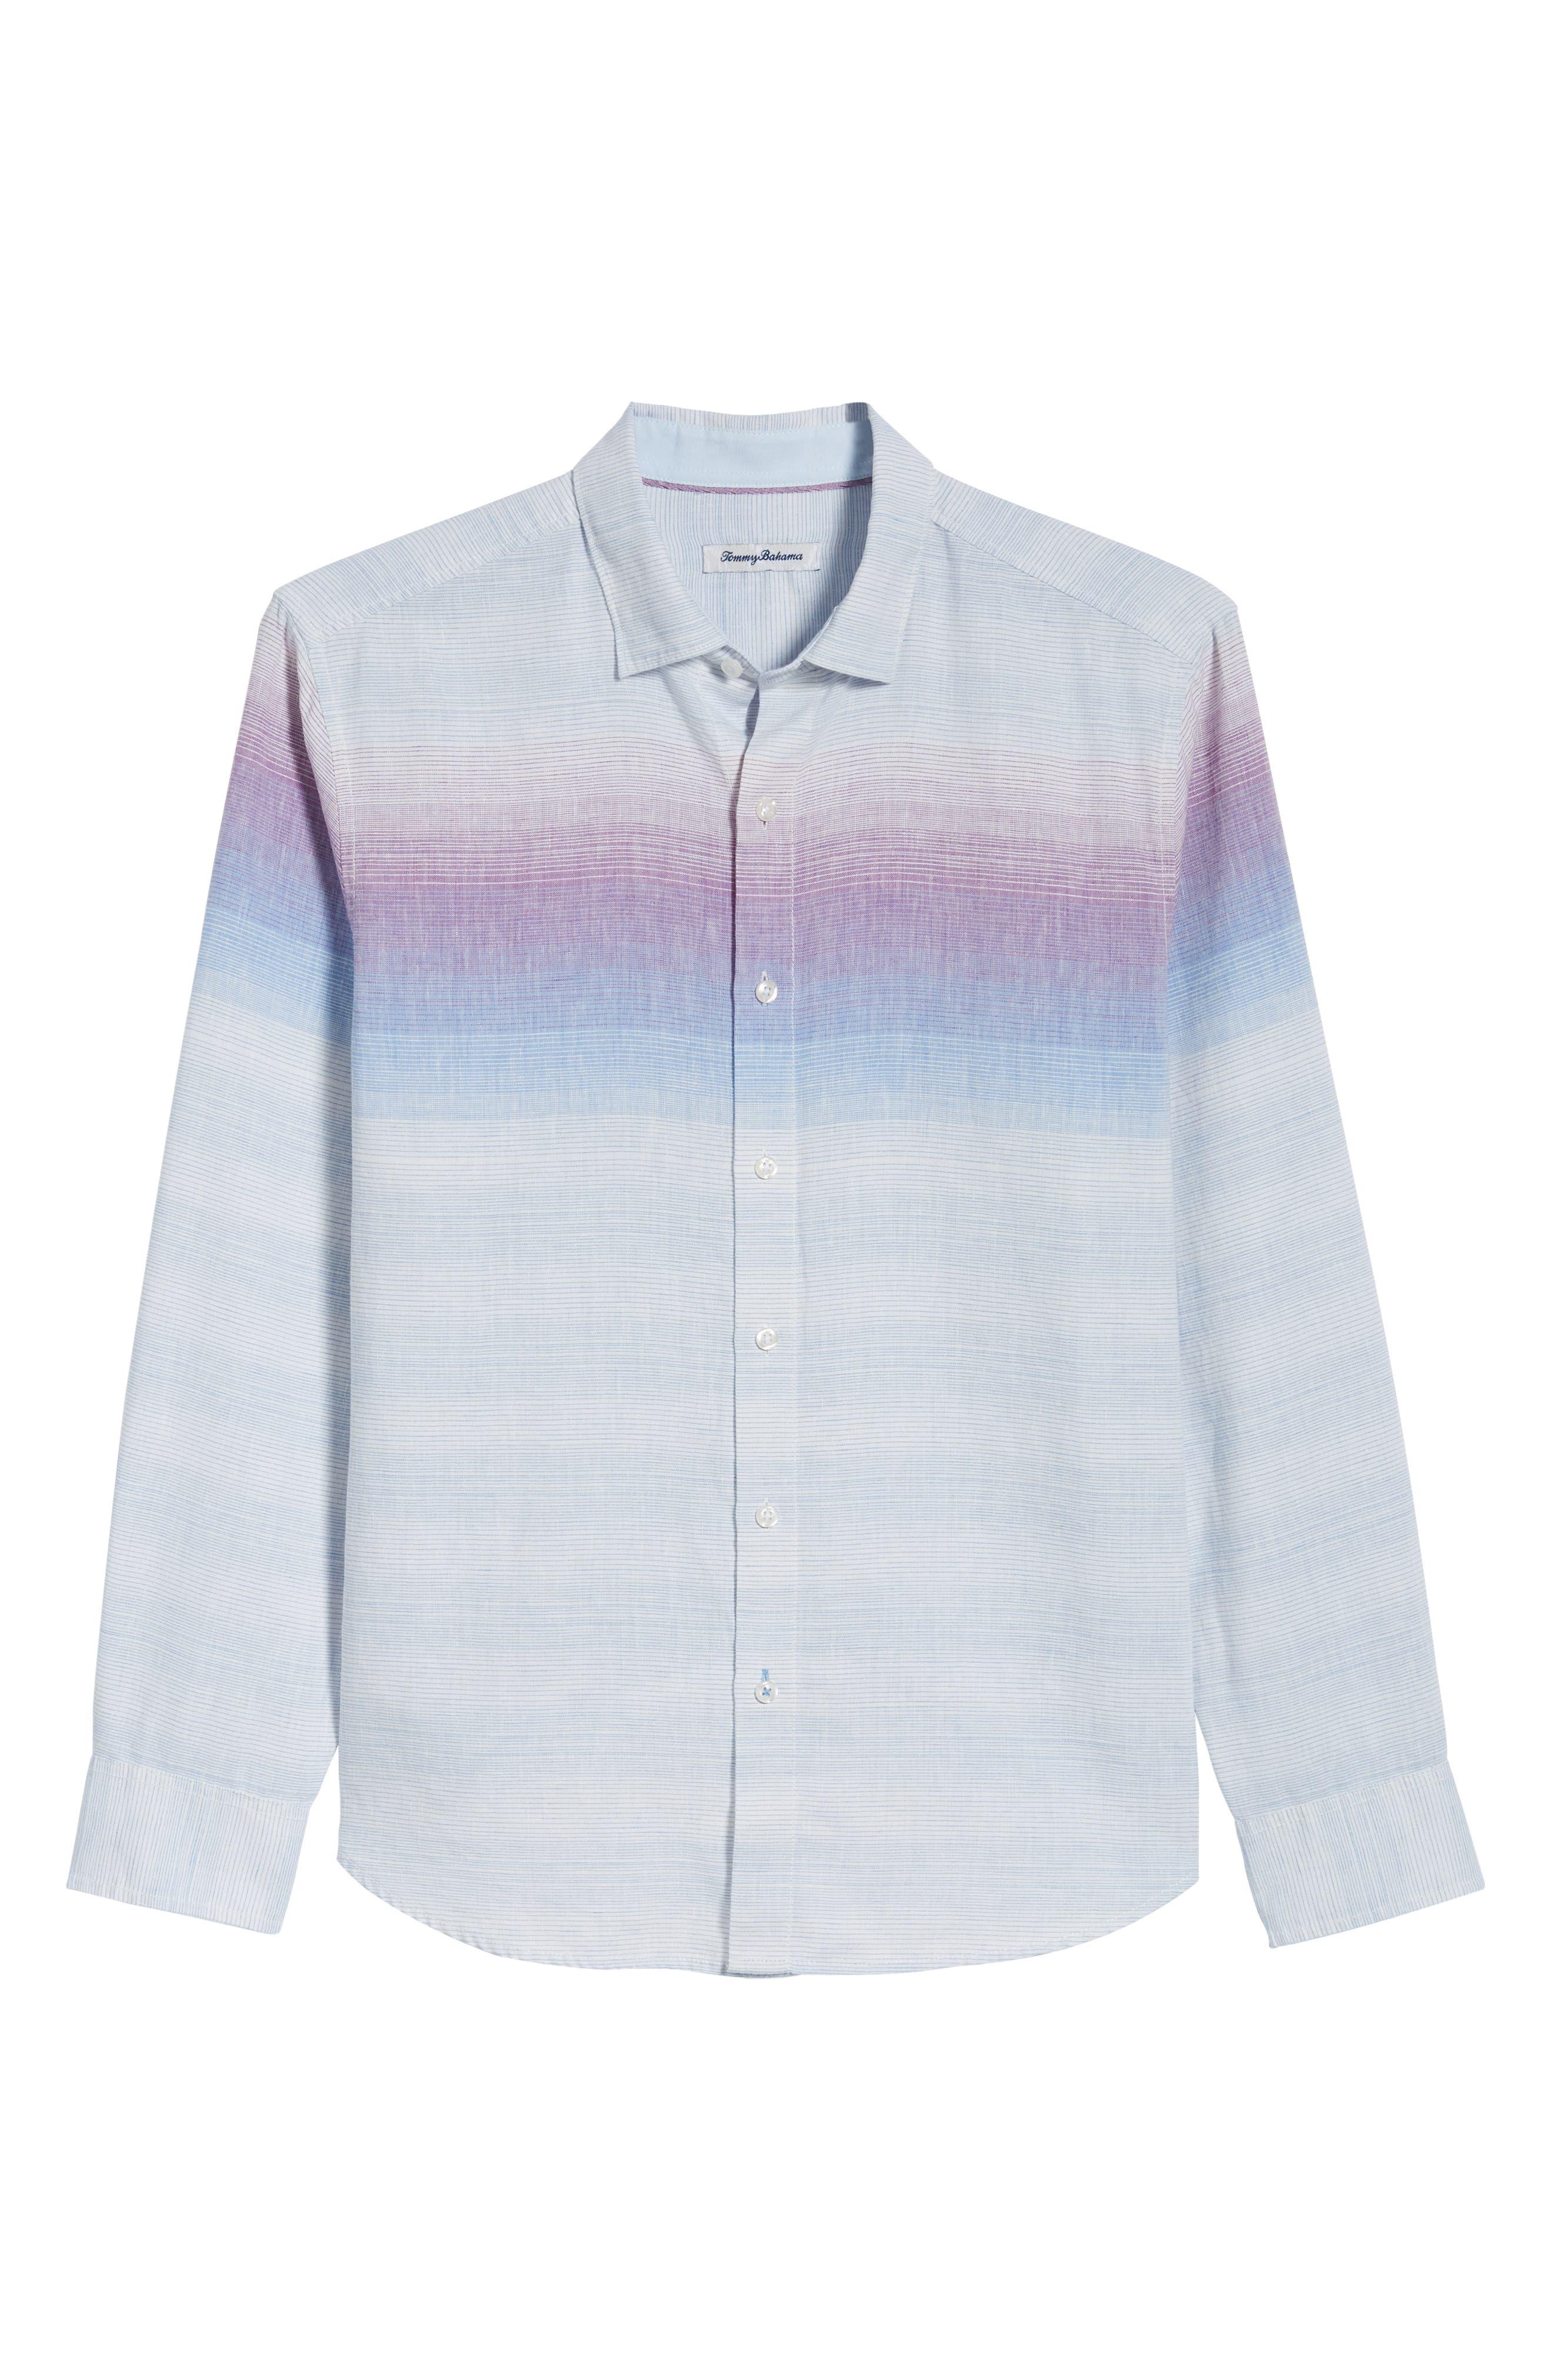 Sunset Ombré Linen Blend Sport Shirt,                             Alternate thumbnail 6, color,                             100